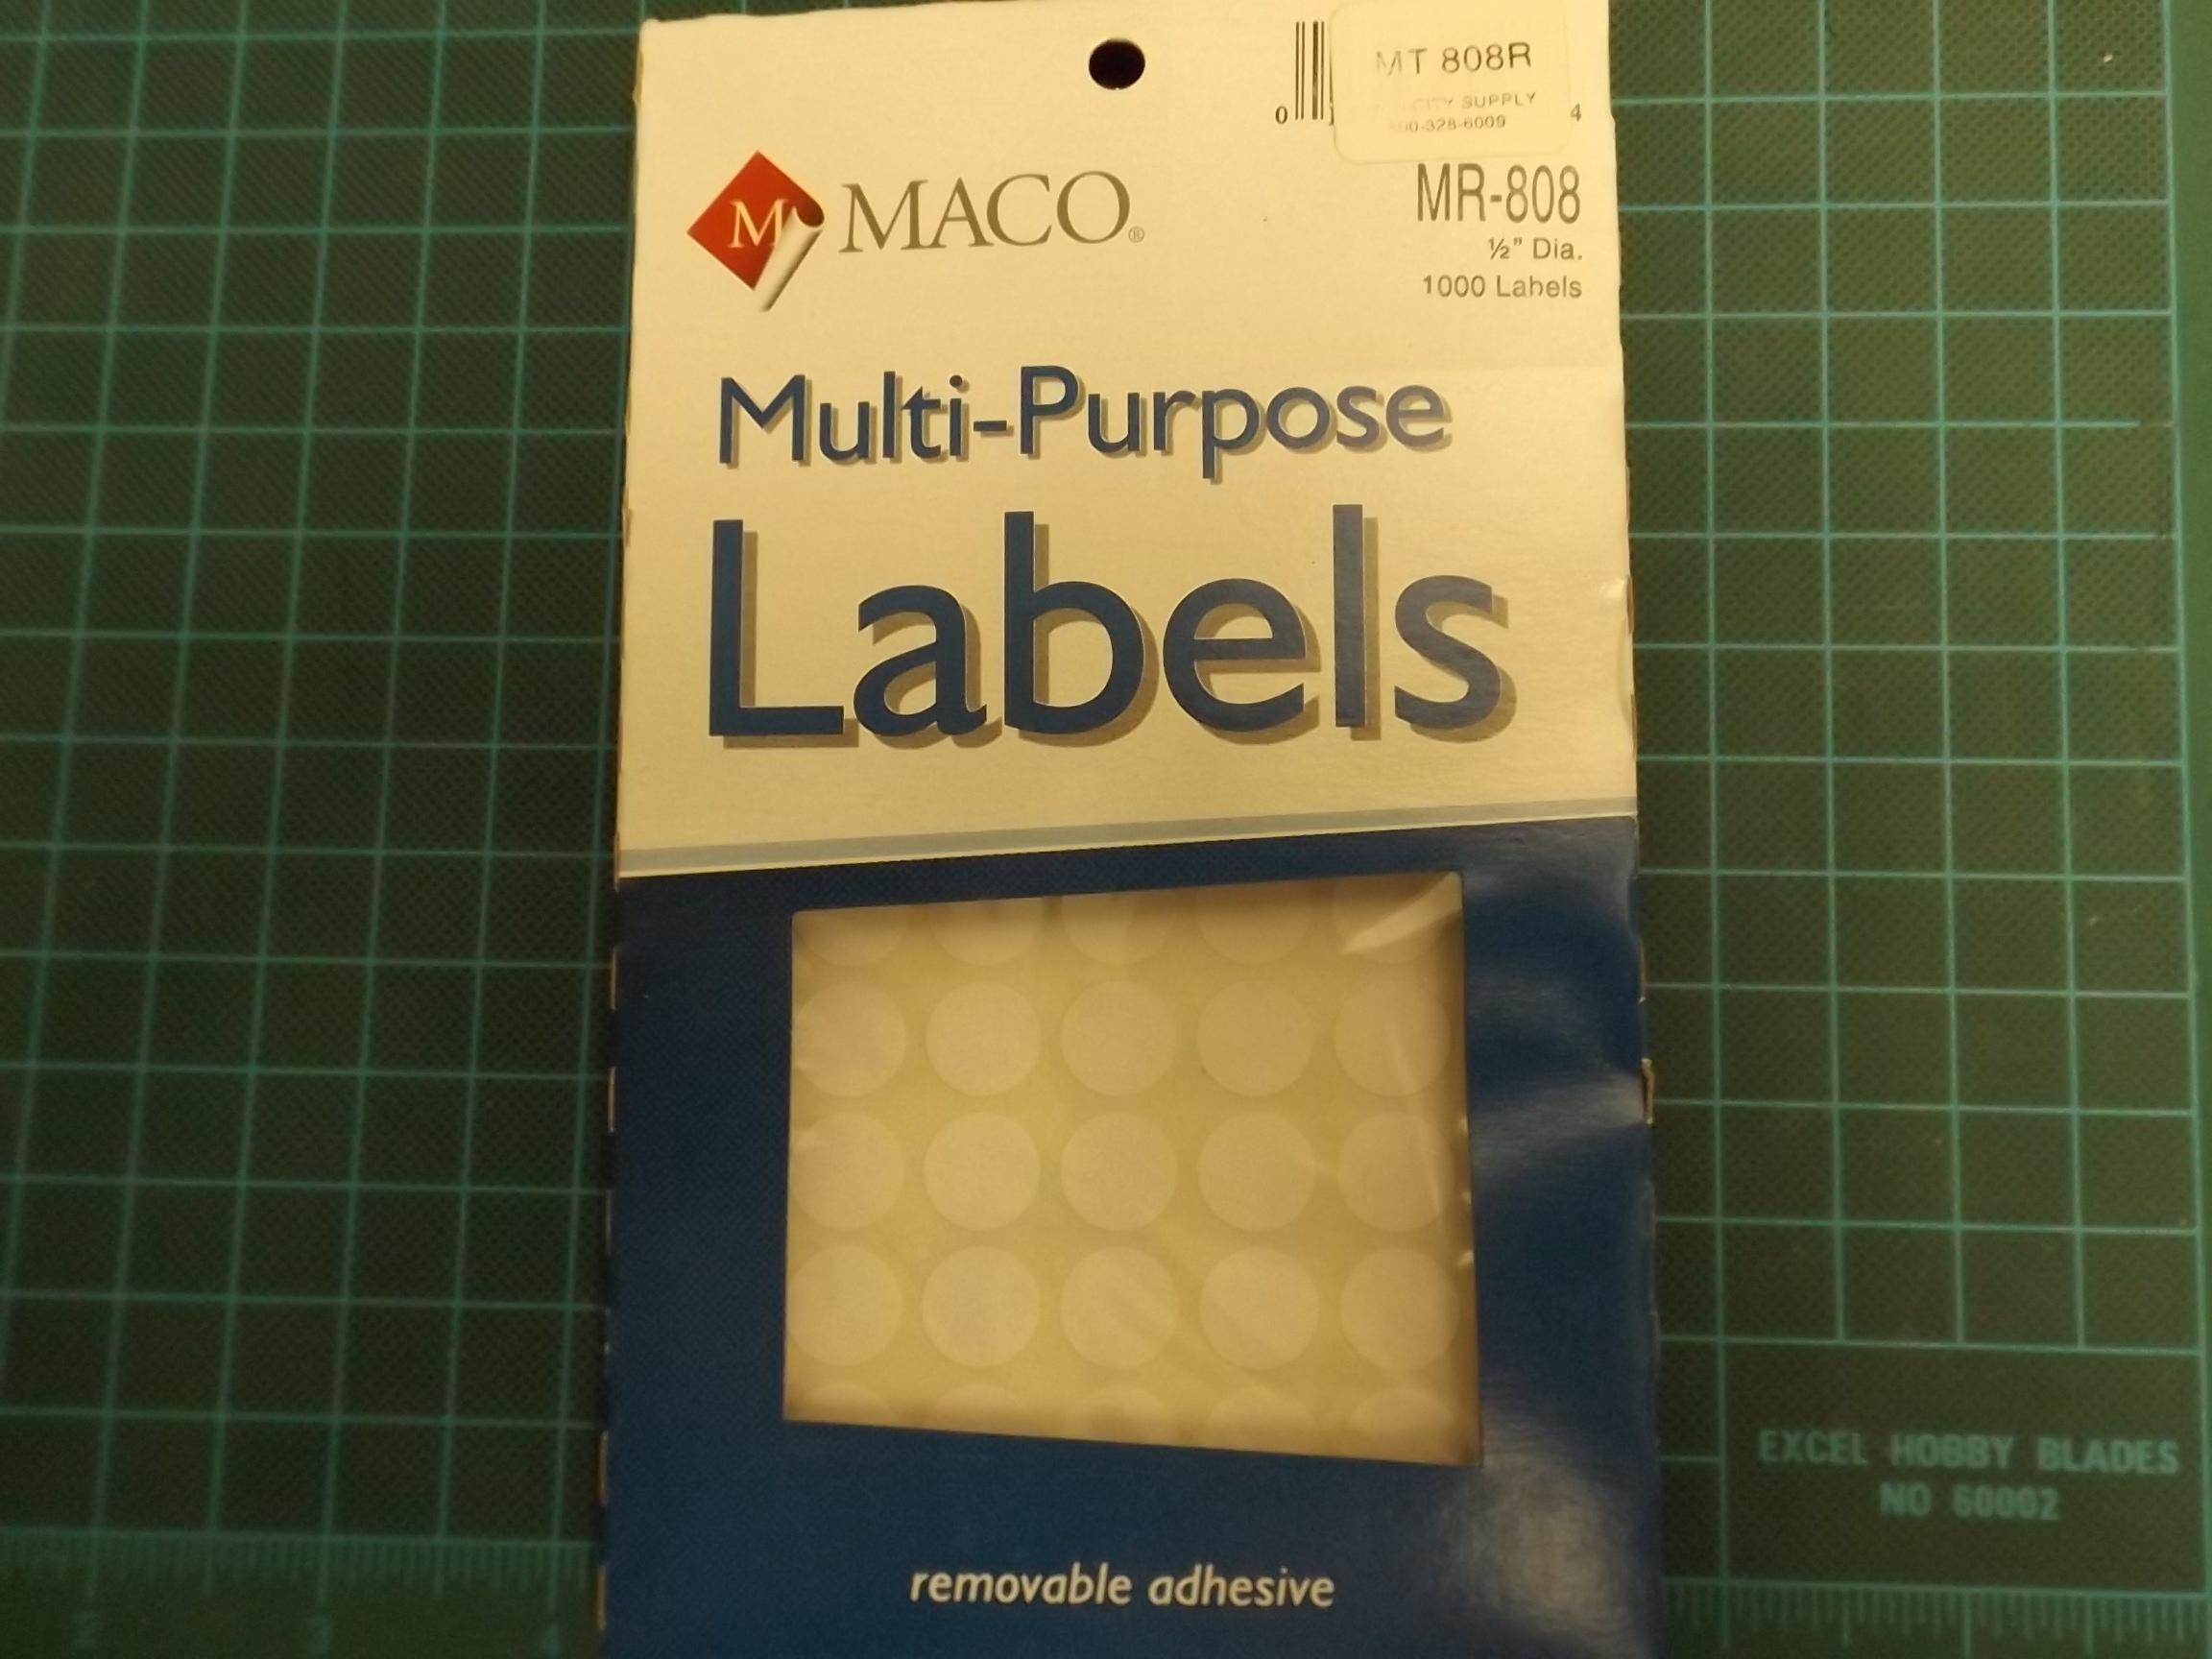 MT808R Maco White Removeable Adhesive Multi-Purpose Labels--Round